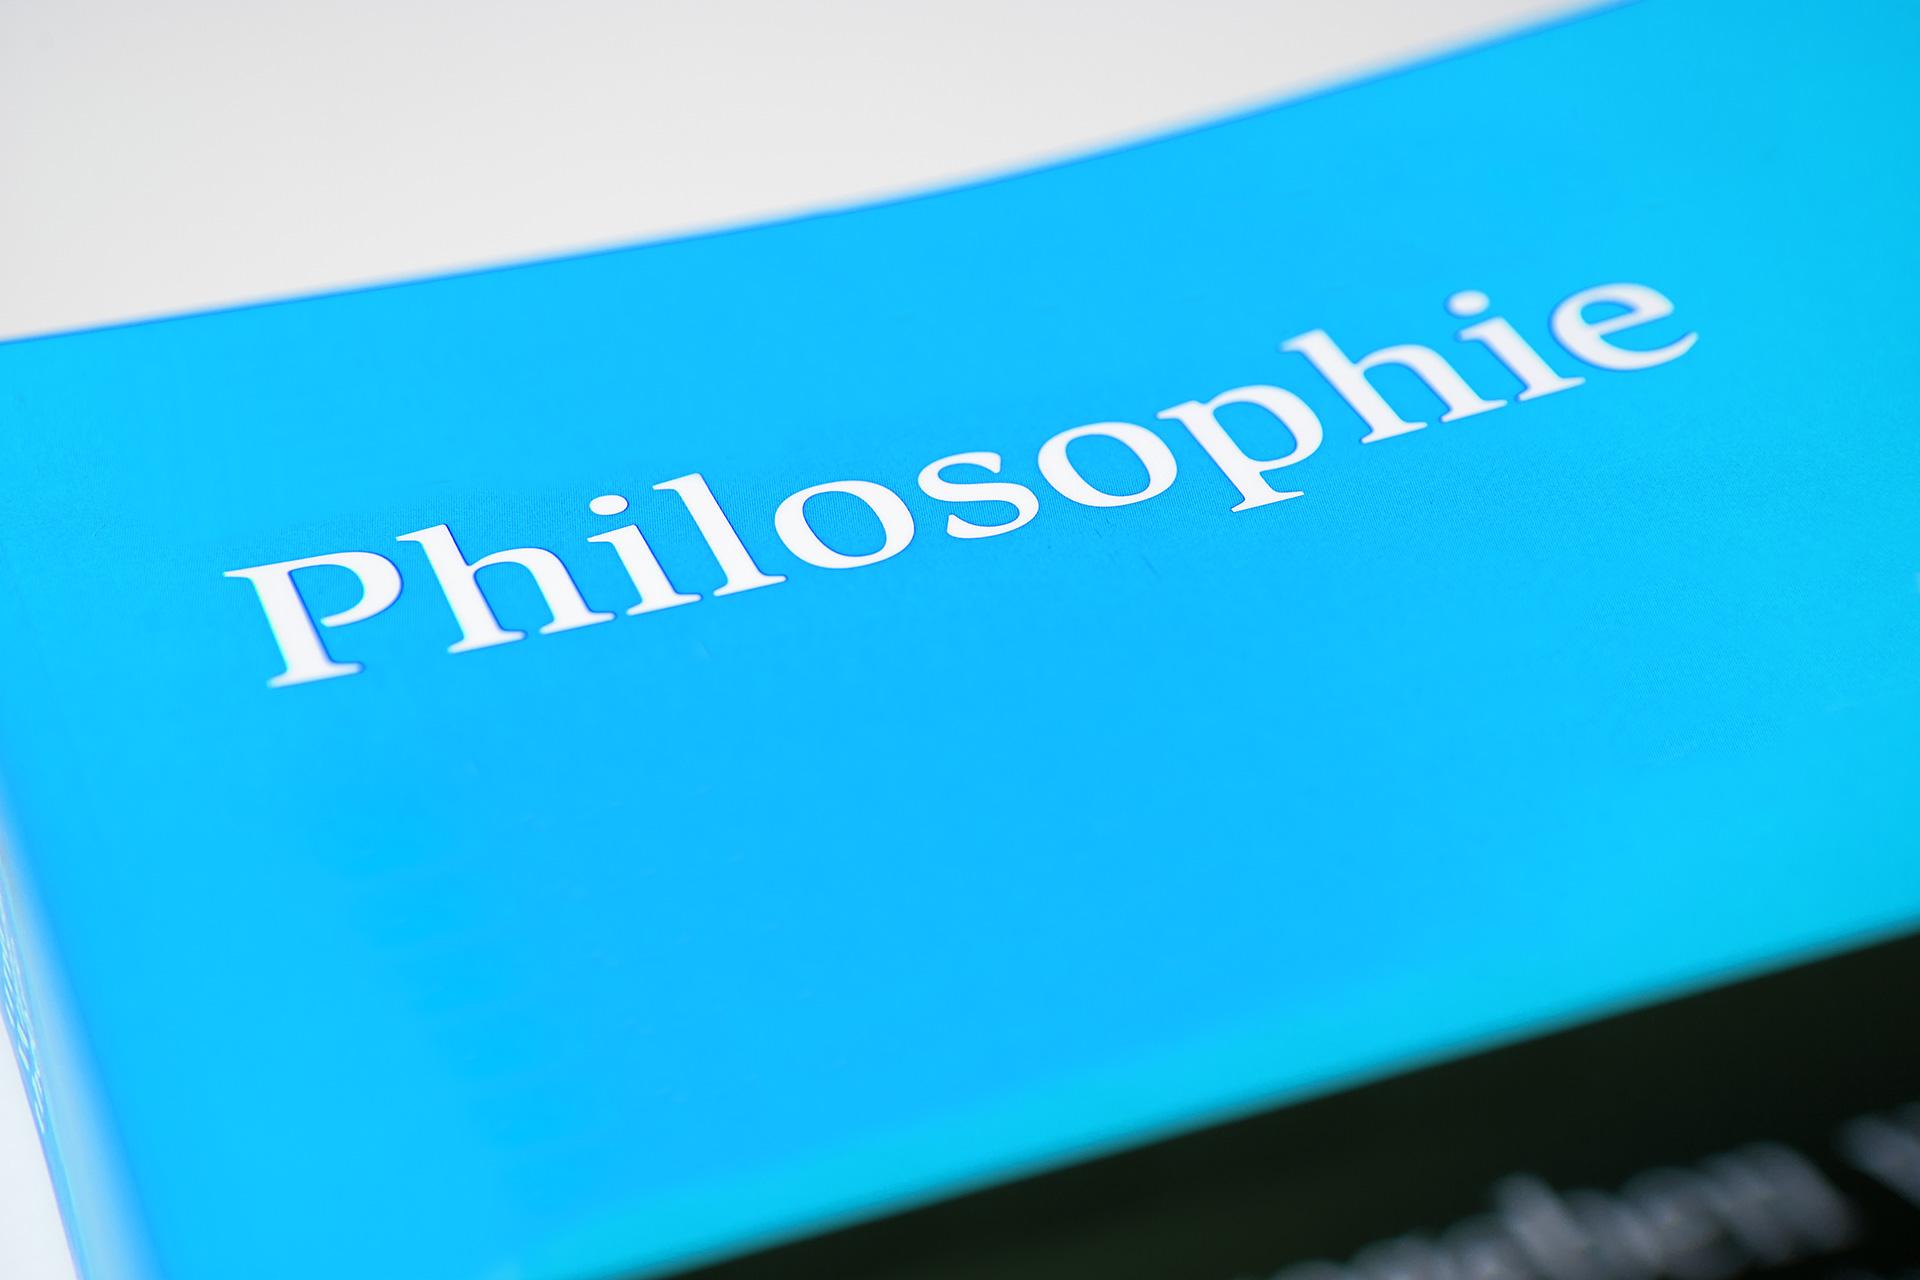 Firmenphilosophie, Philosophie